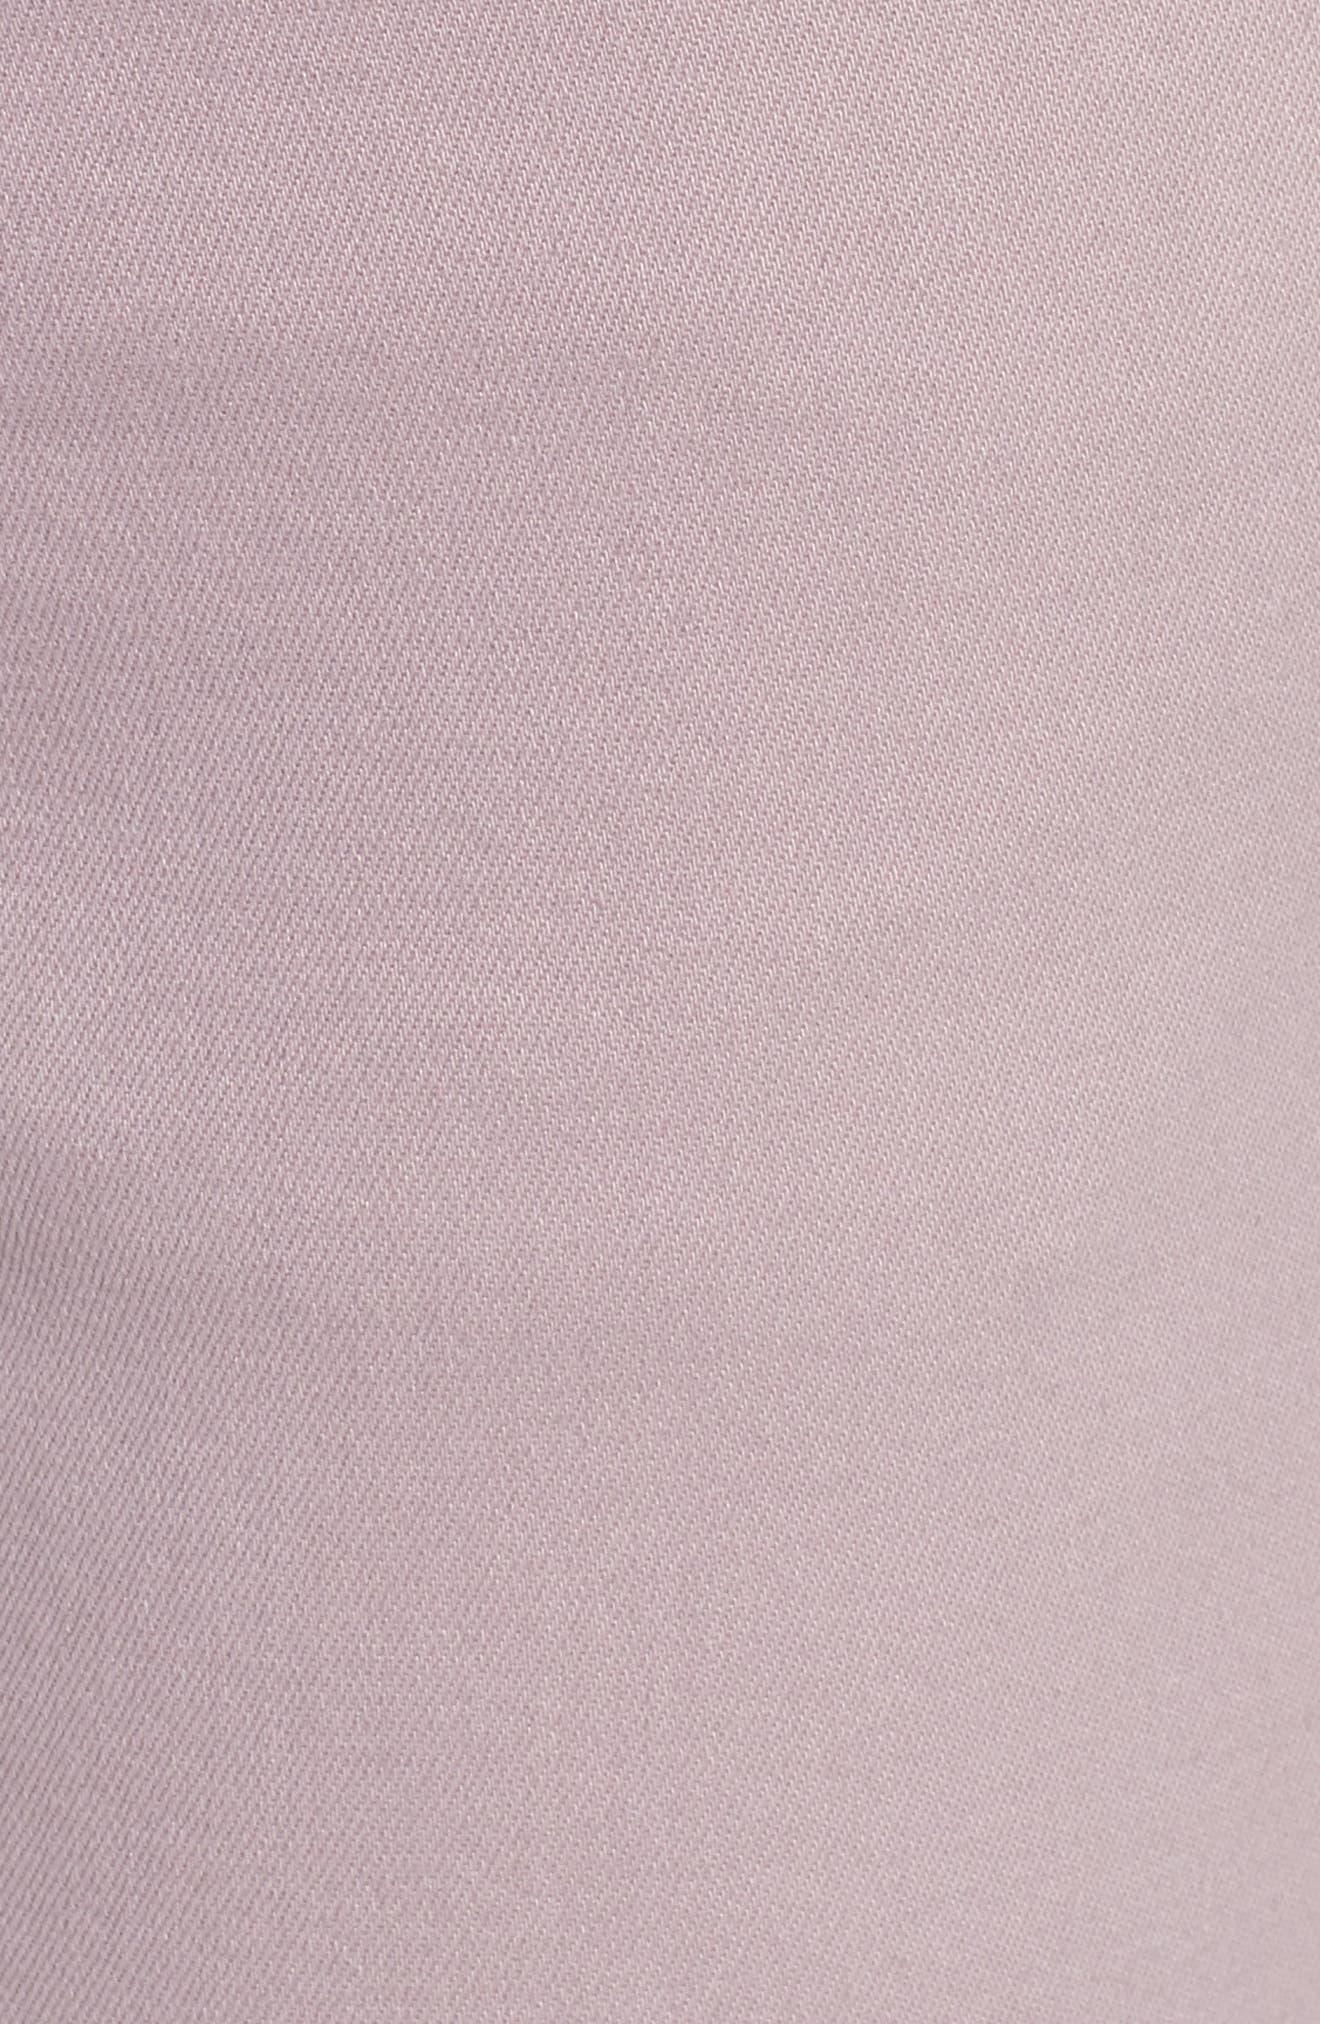 Florence Instasculpt Crop Skinny Jeans,                             Alternate thumbnail 6, color,                             Magnolia